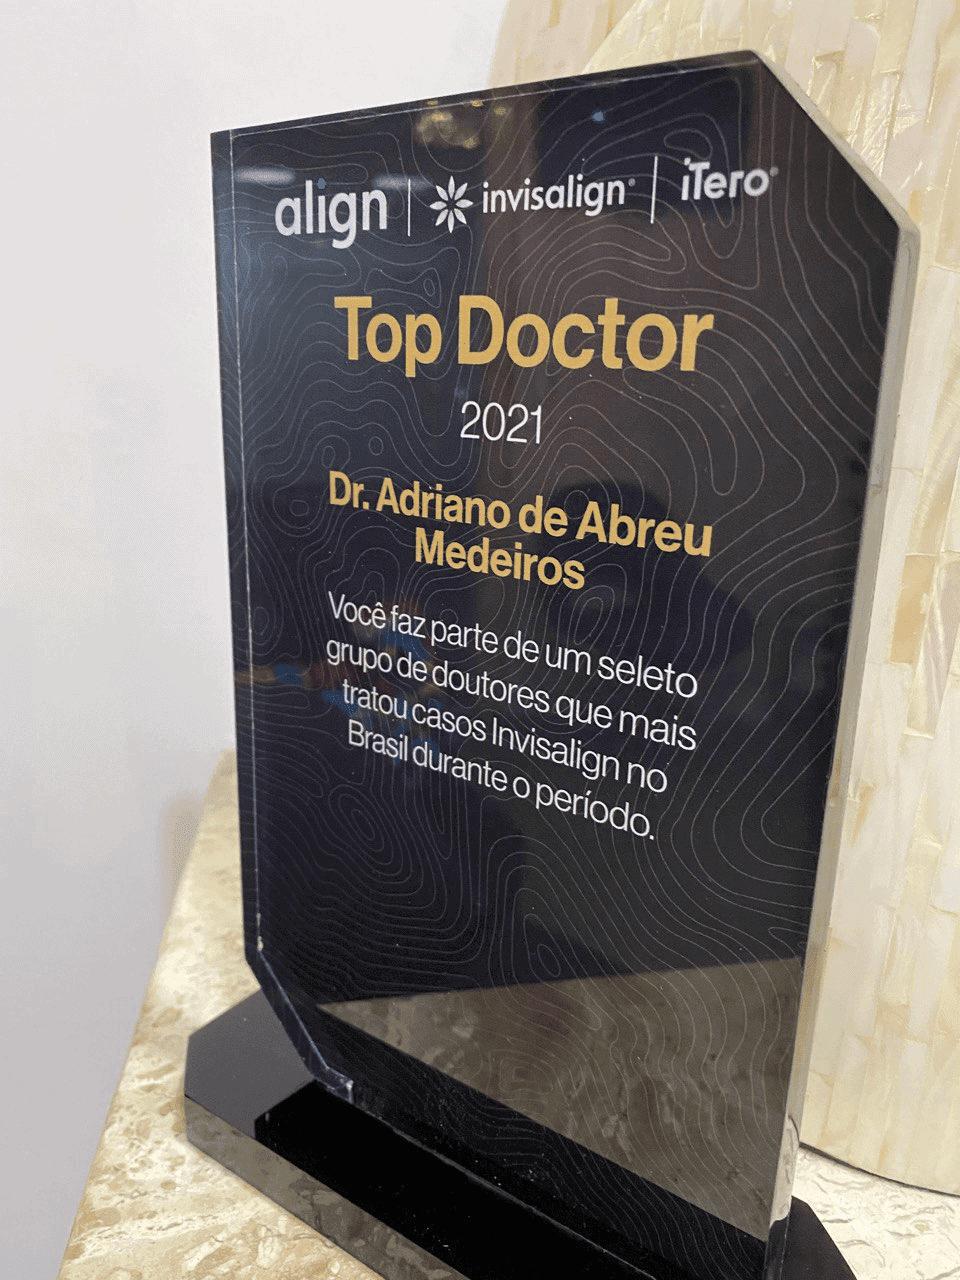 Top doctor Dr Adriano Abreu